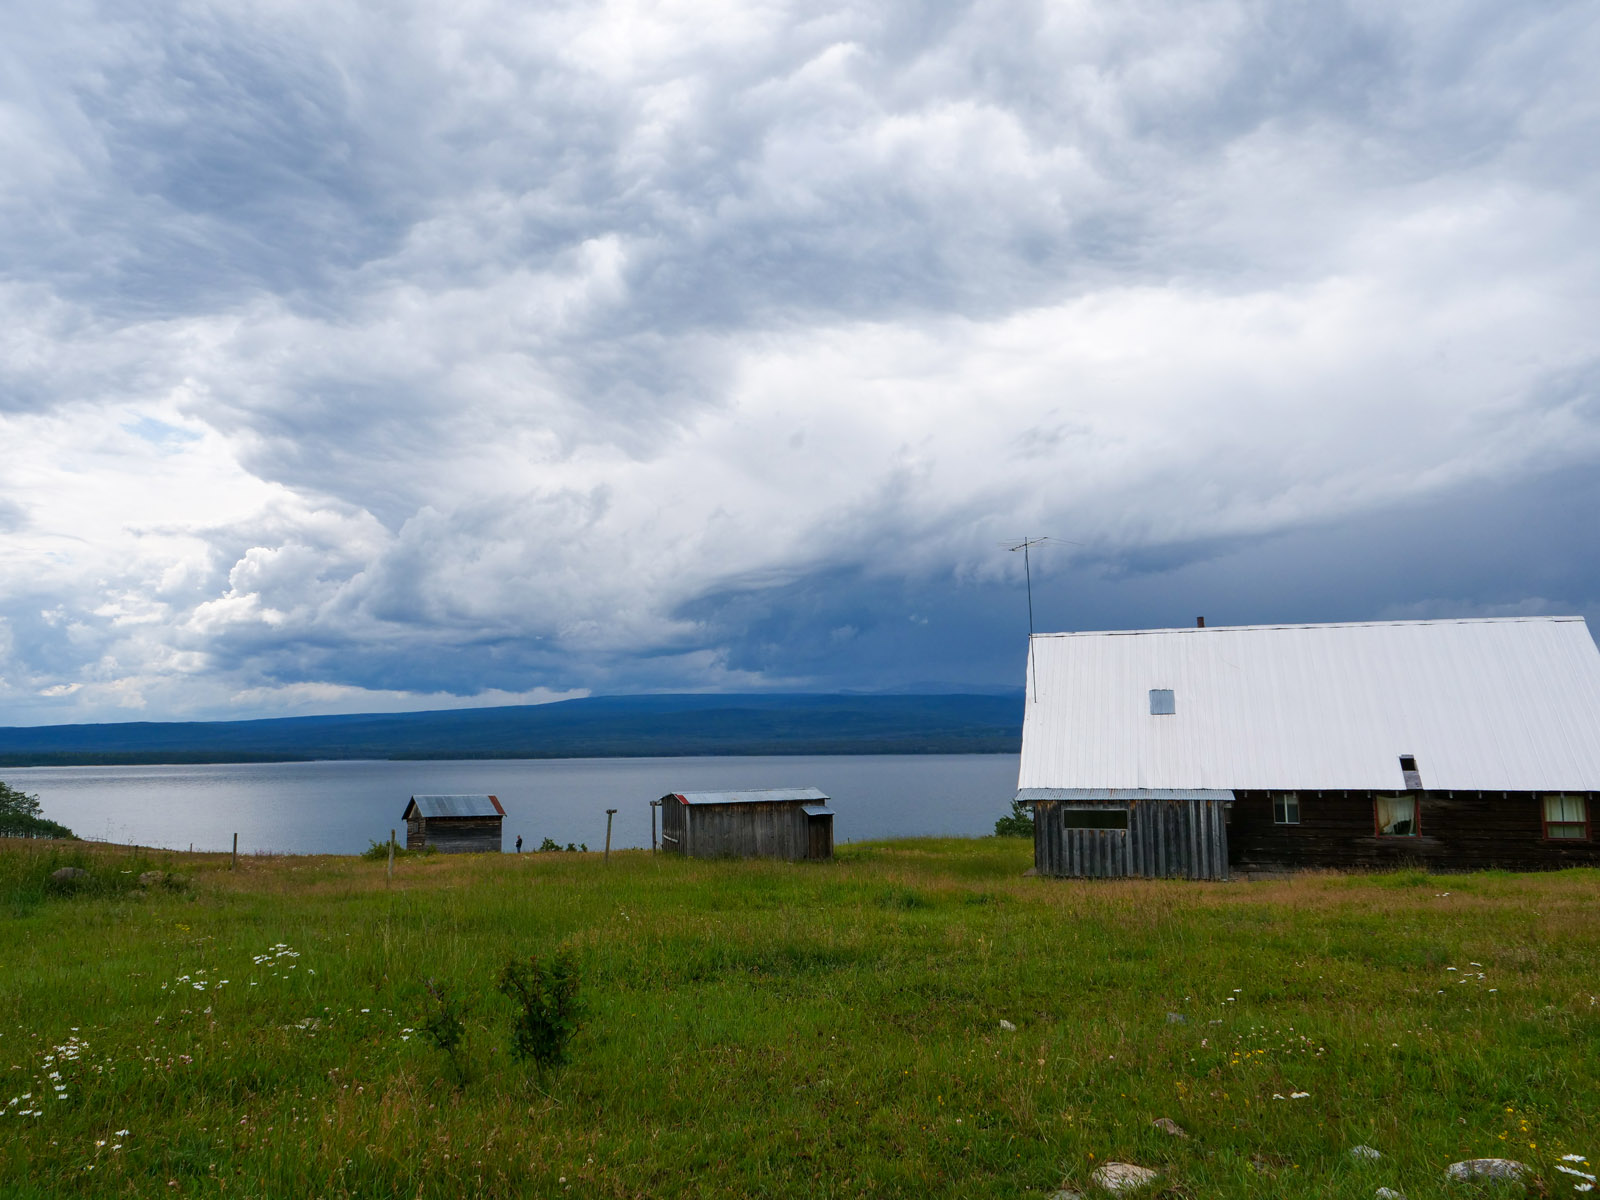 Wistaria farmland ootsa lake 08